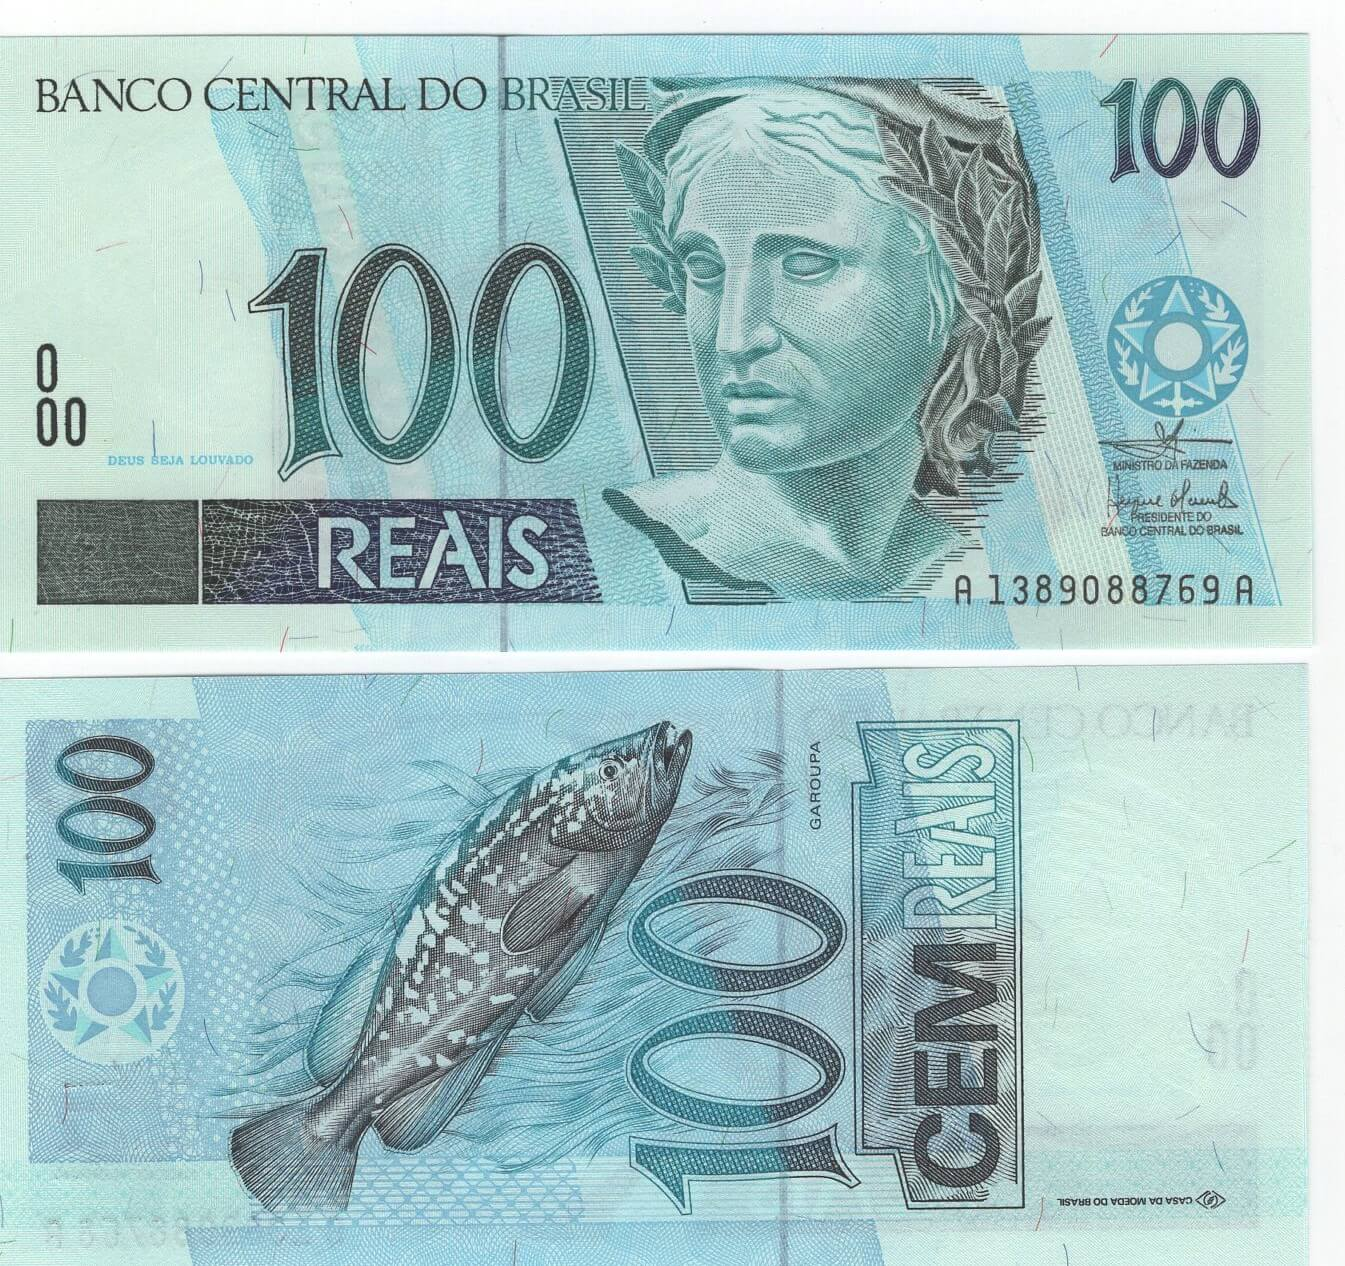 C329 Cédula Brasil 100 Reais (Mantega/Meirelles) FE